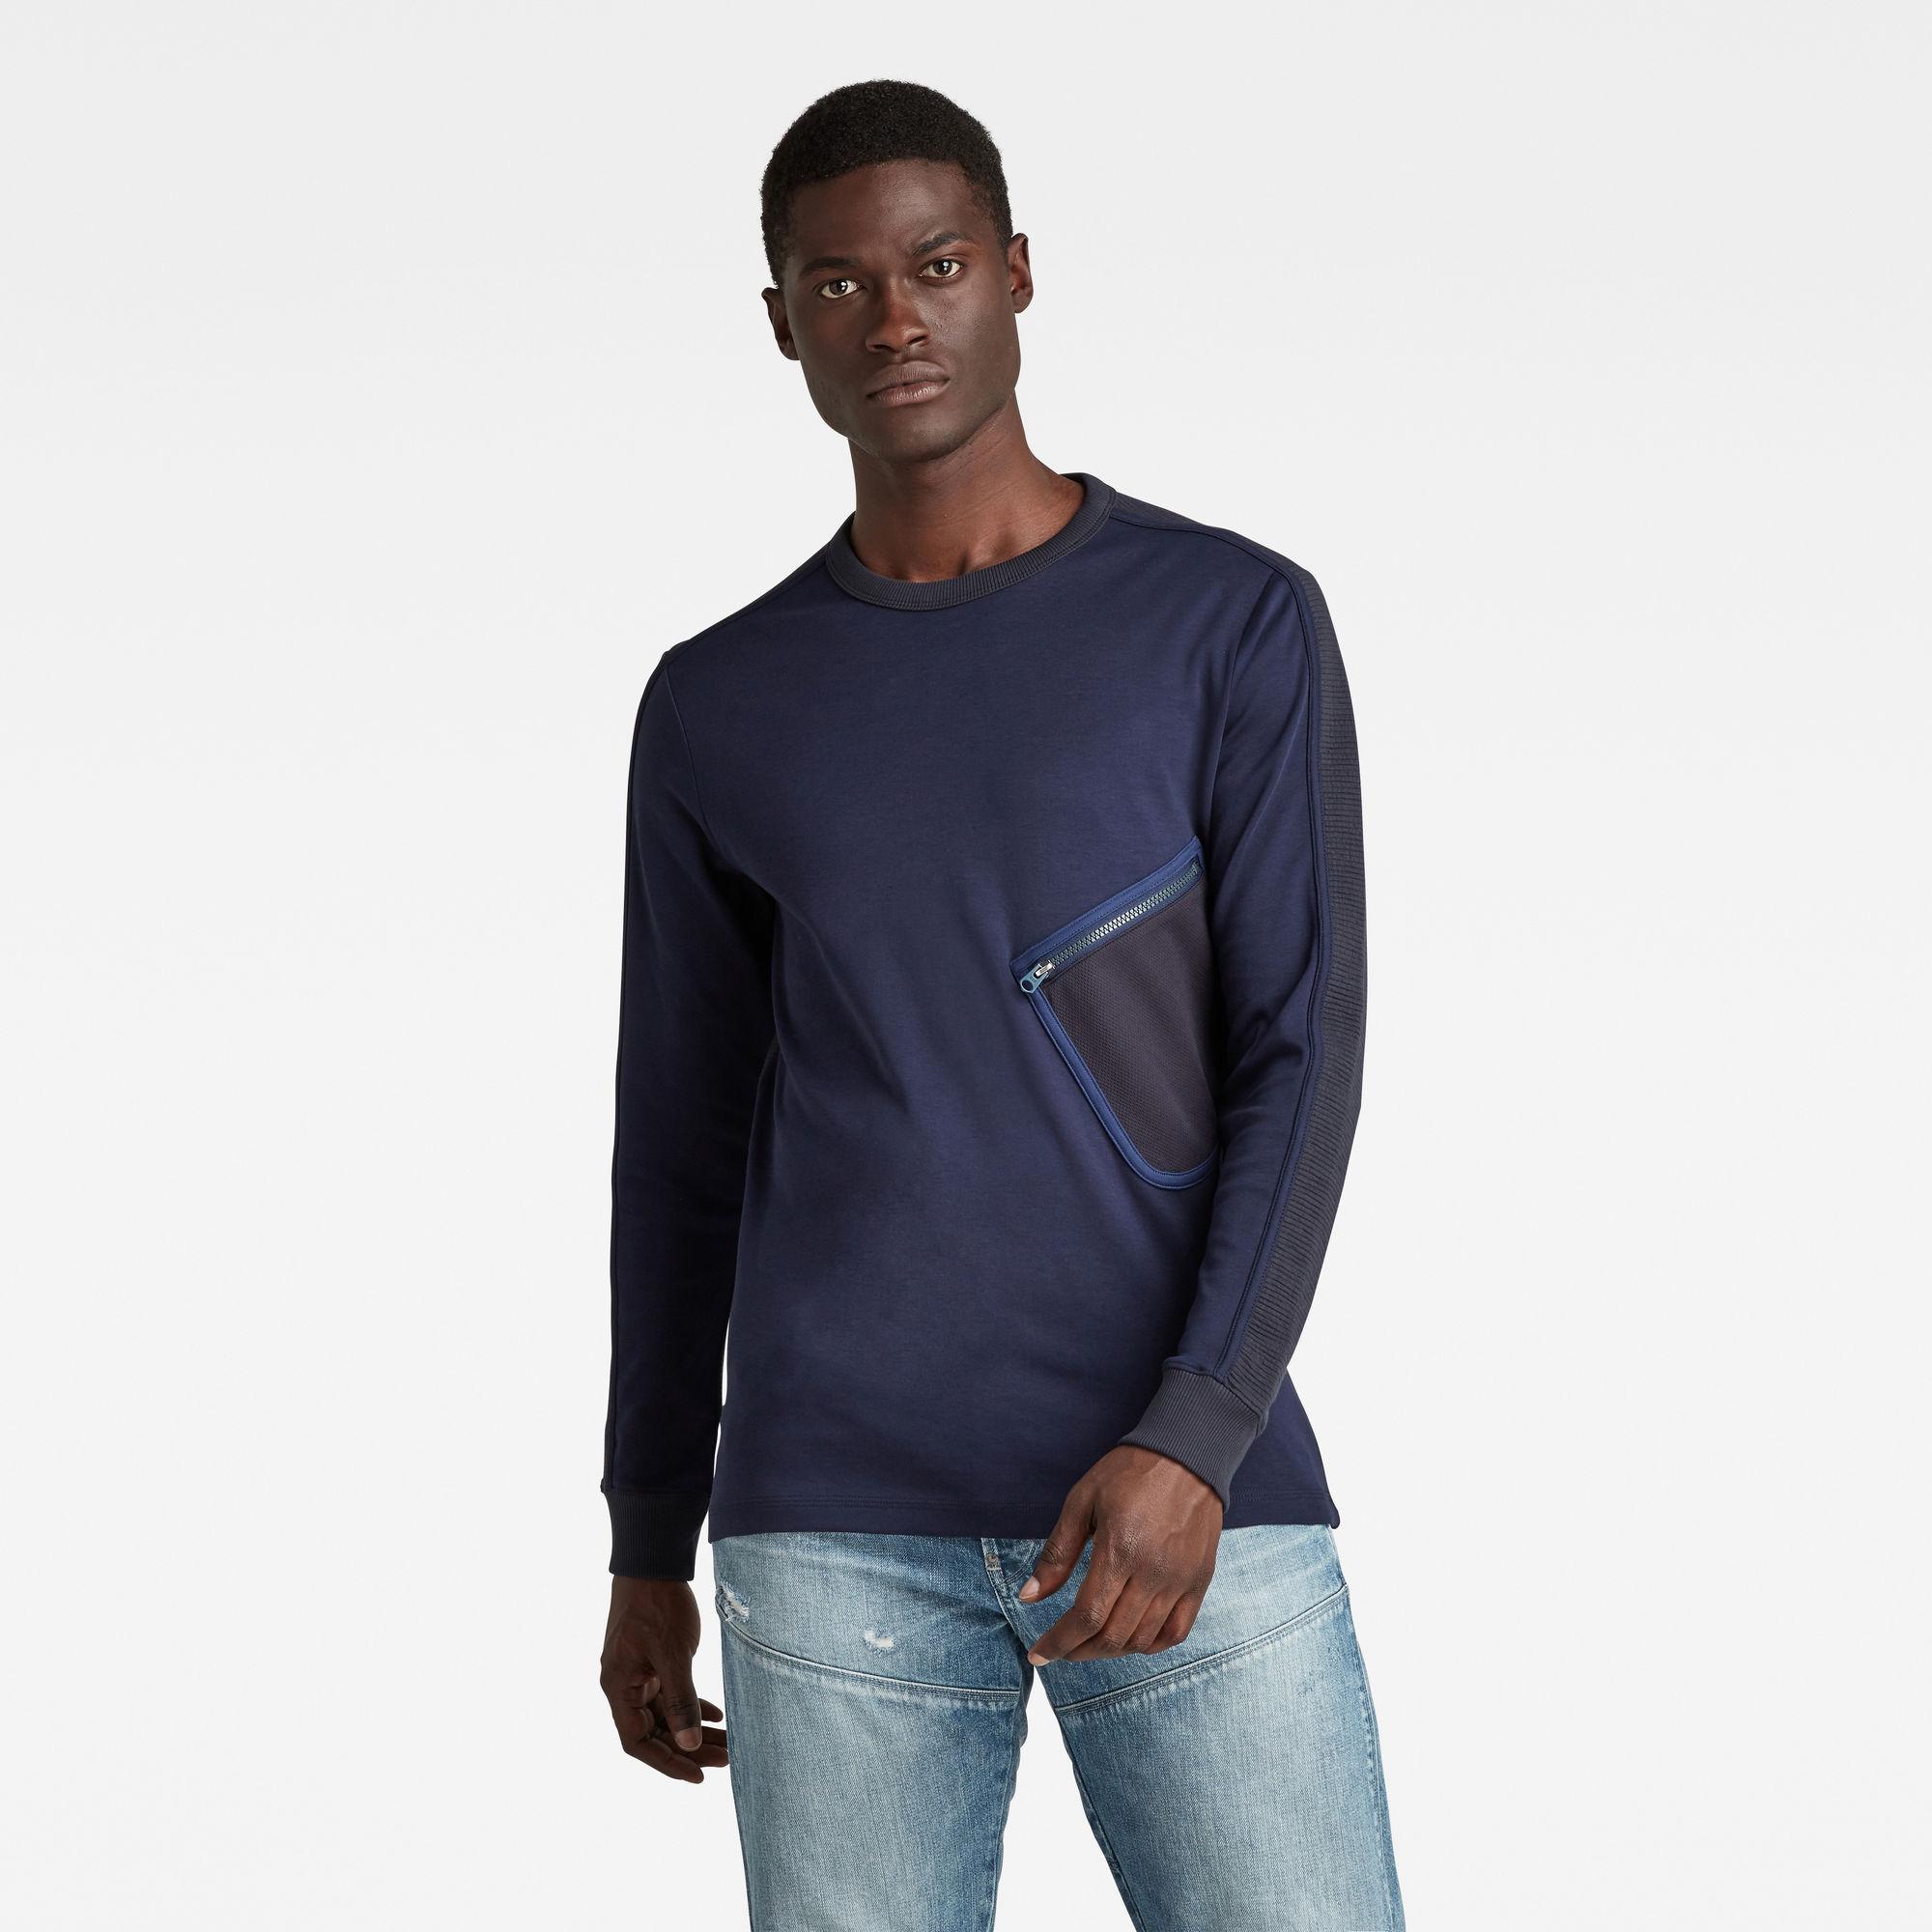 G-Star RAW Heren Mesh Pocket Tweeter T-Shirt Donkerblauw